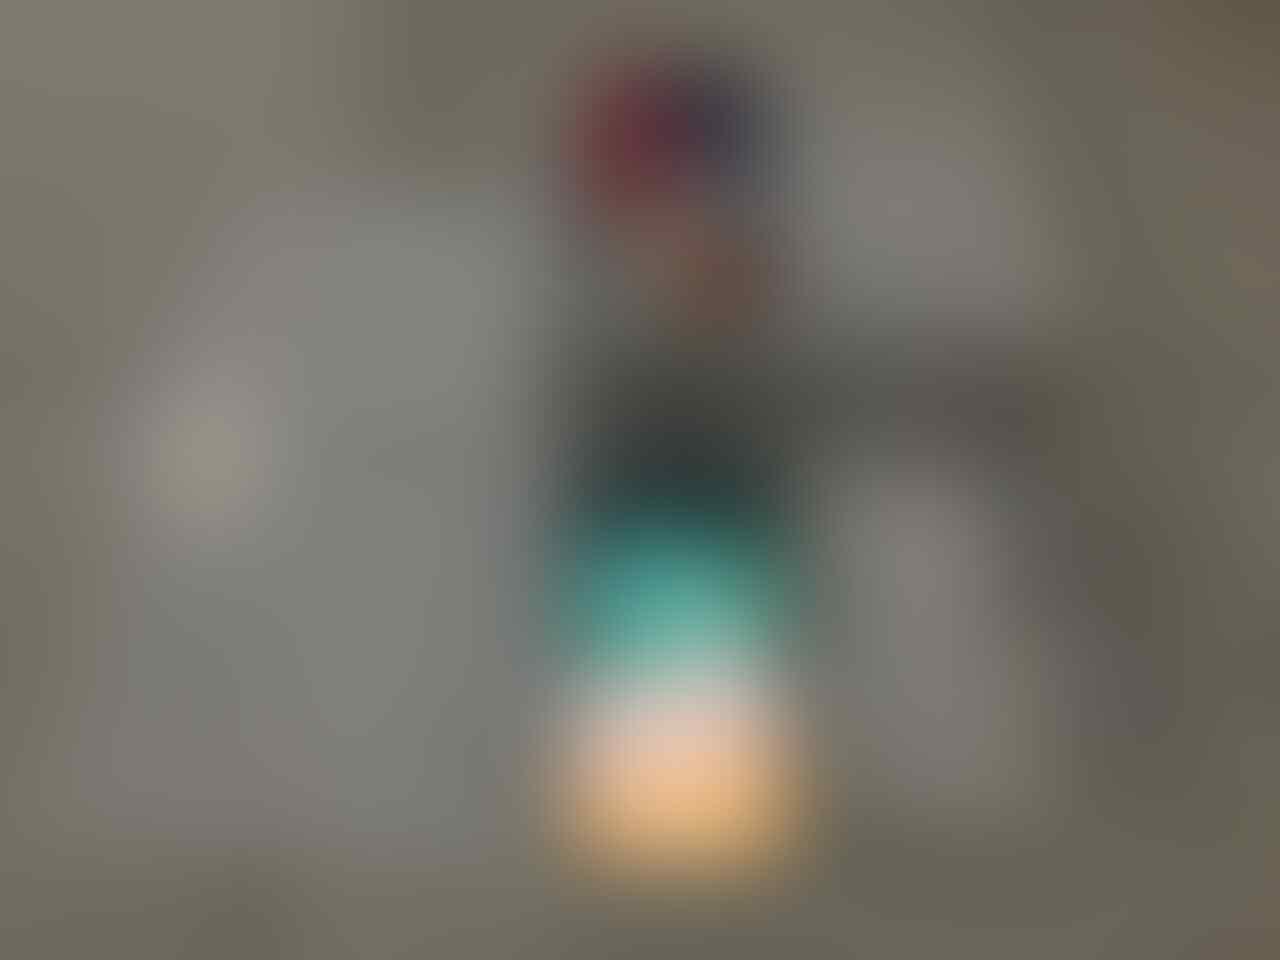 IPHONE X GREY 256GB FULLSET MULUUSS GARANSI DESEMBER 2018 MURAAHH 15250 SAJA [MALANG]